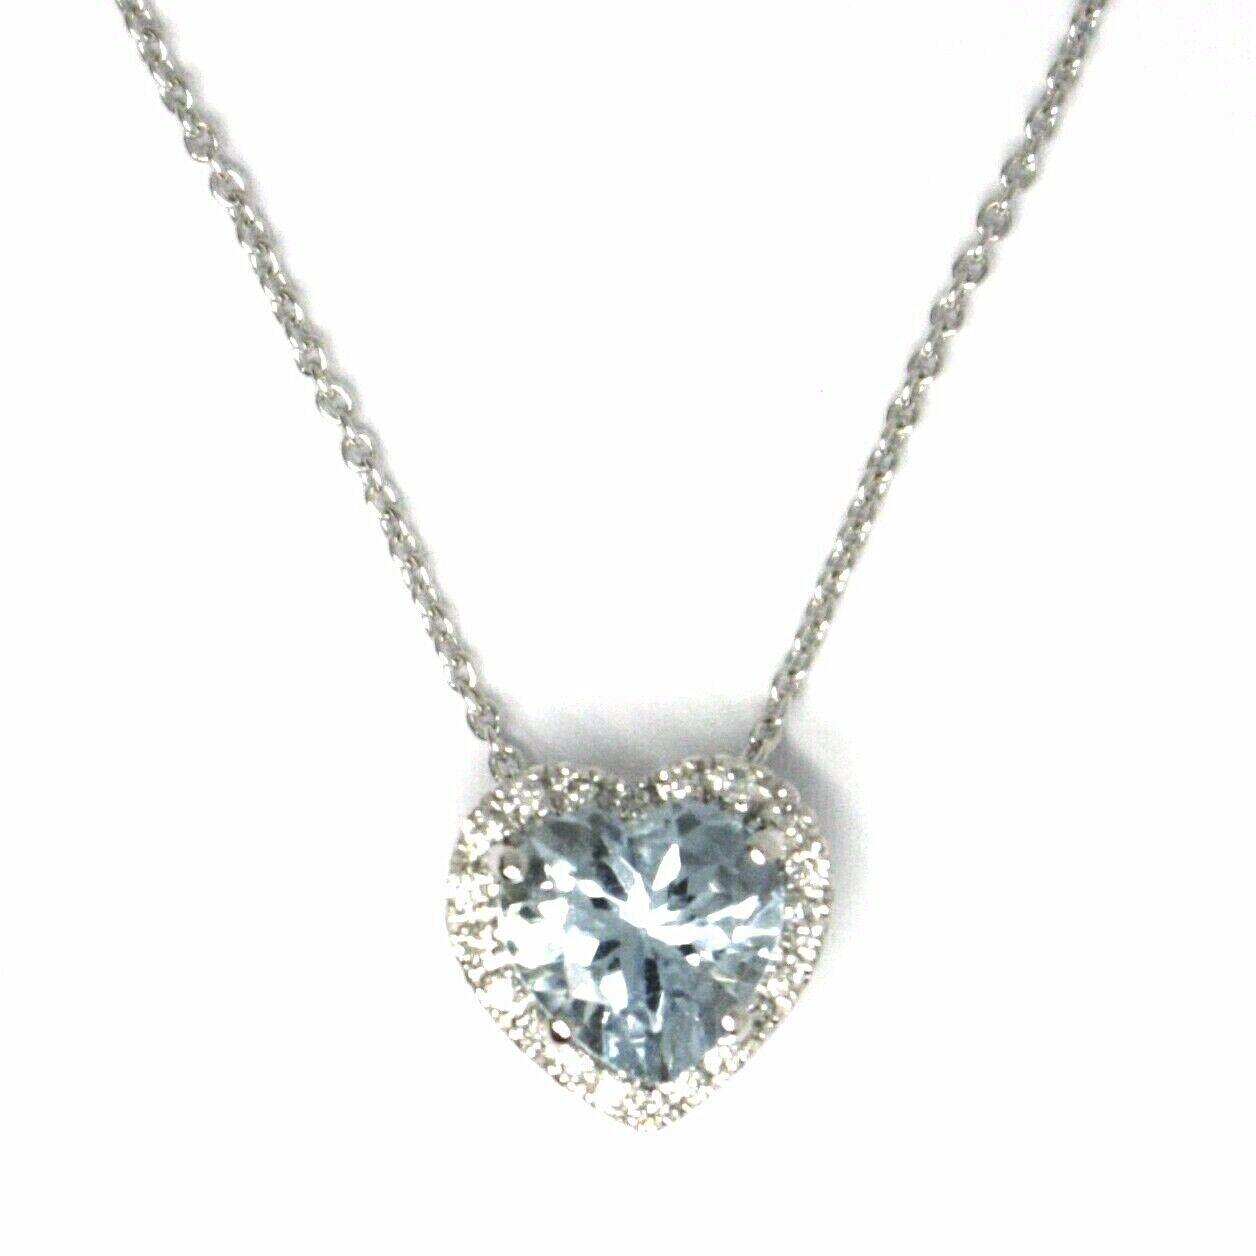 18K WHITE GOLD NECKLACE LOVE HEART PENDANT AQUAMARINE DIAMONDS FRAME ROLO CHAIN